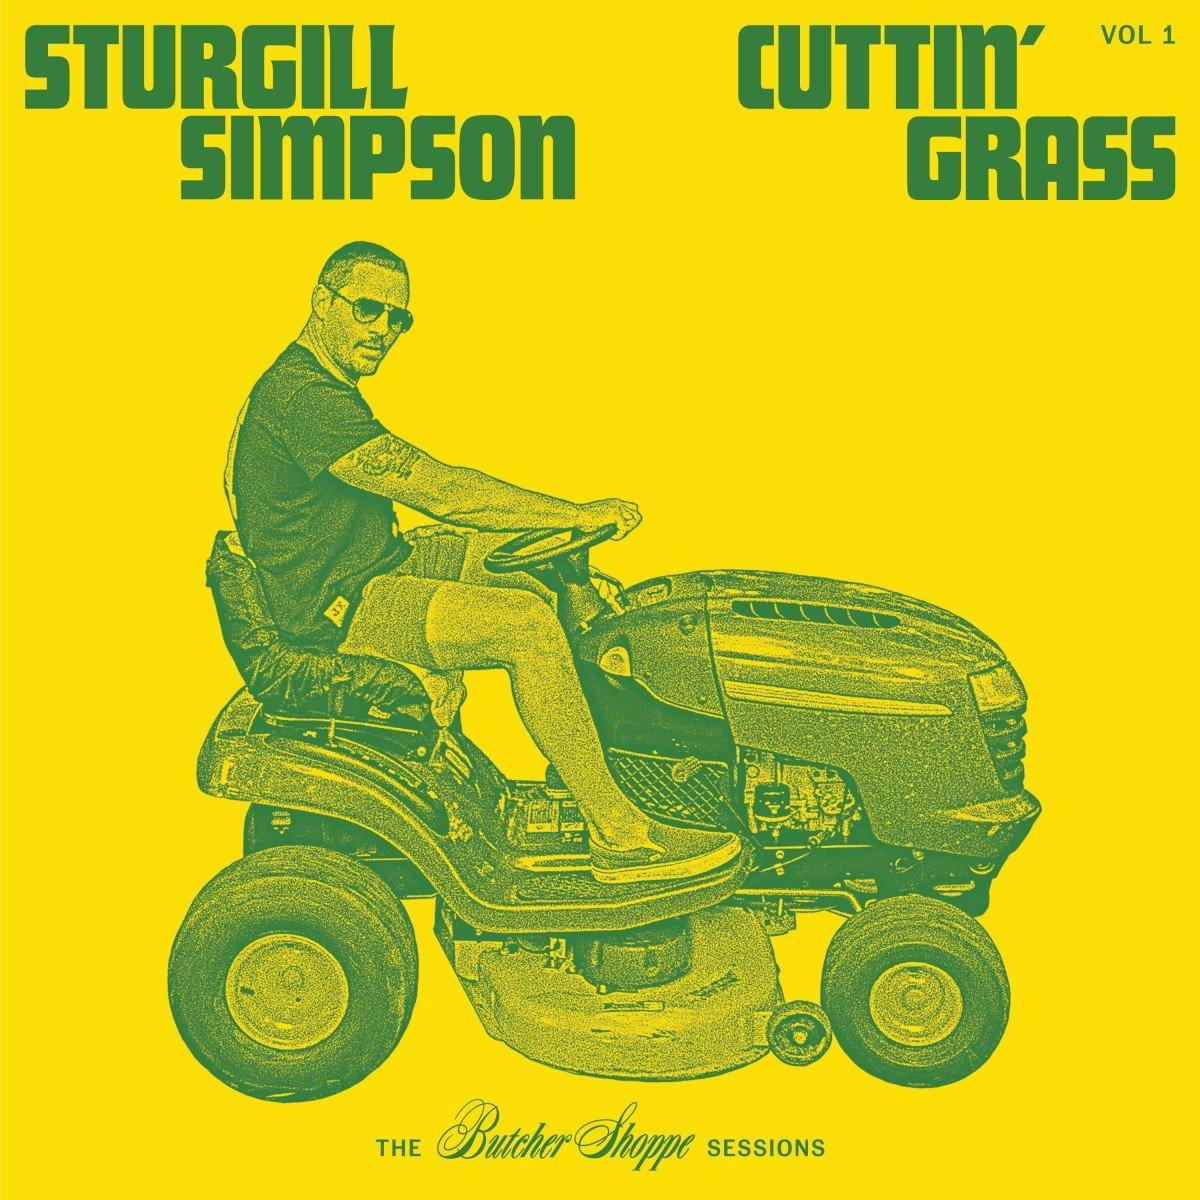 sturgill simpson cuttin grass 2020 album cover art